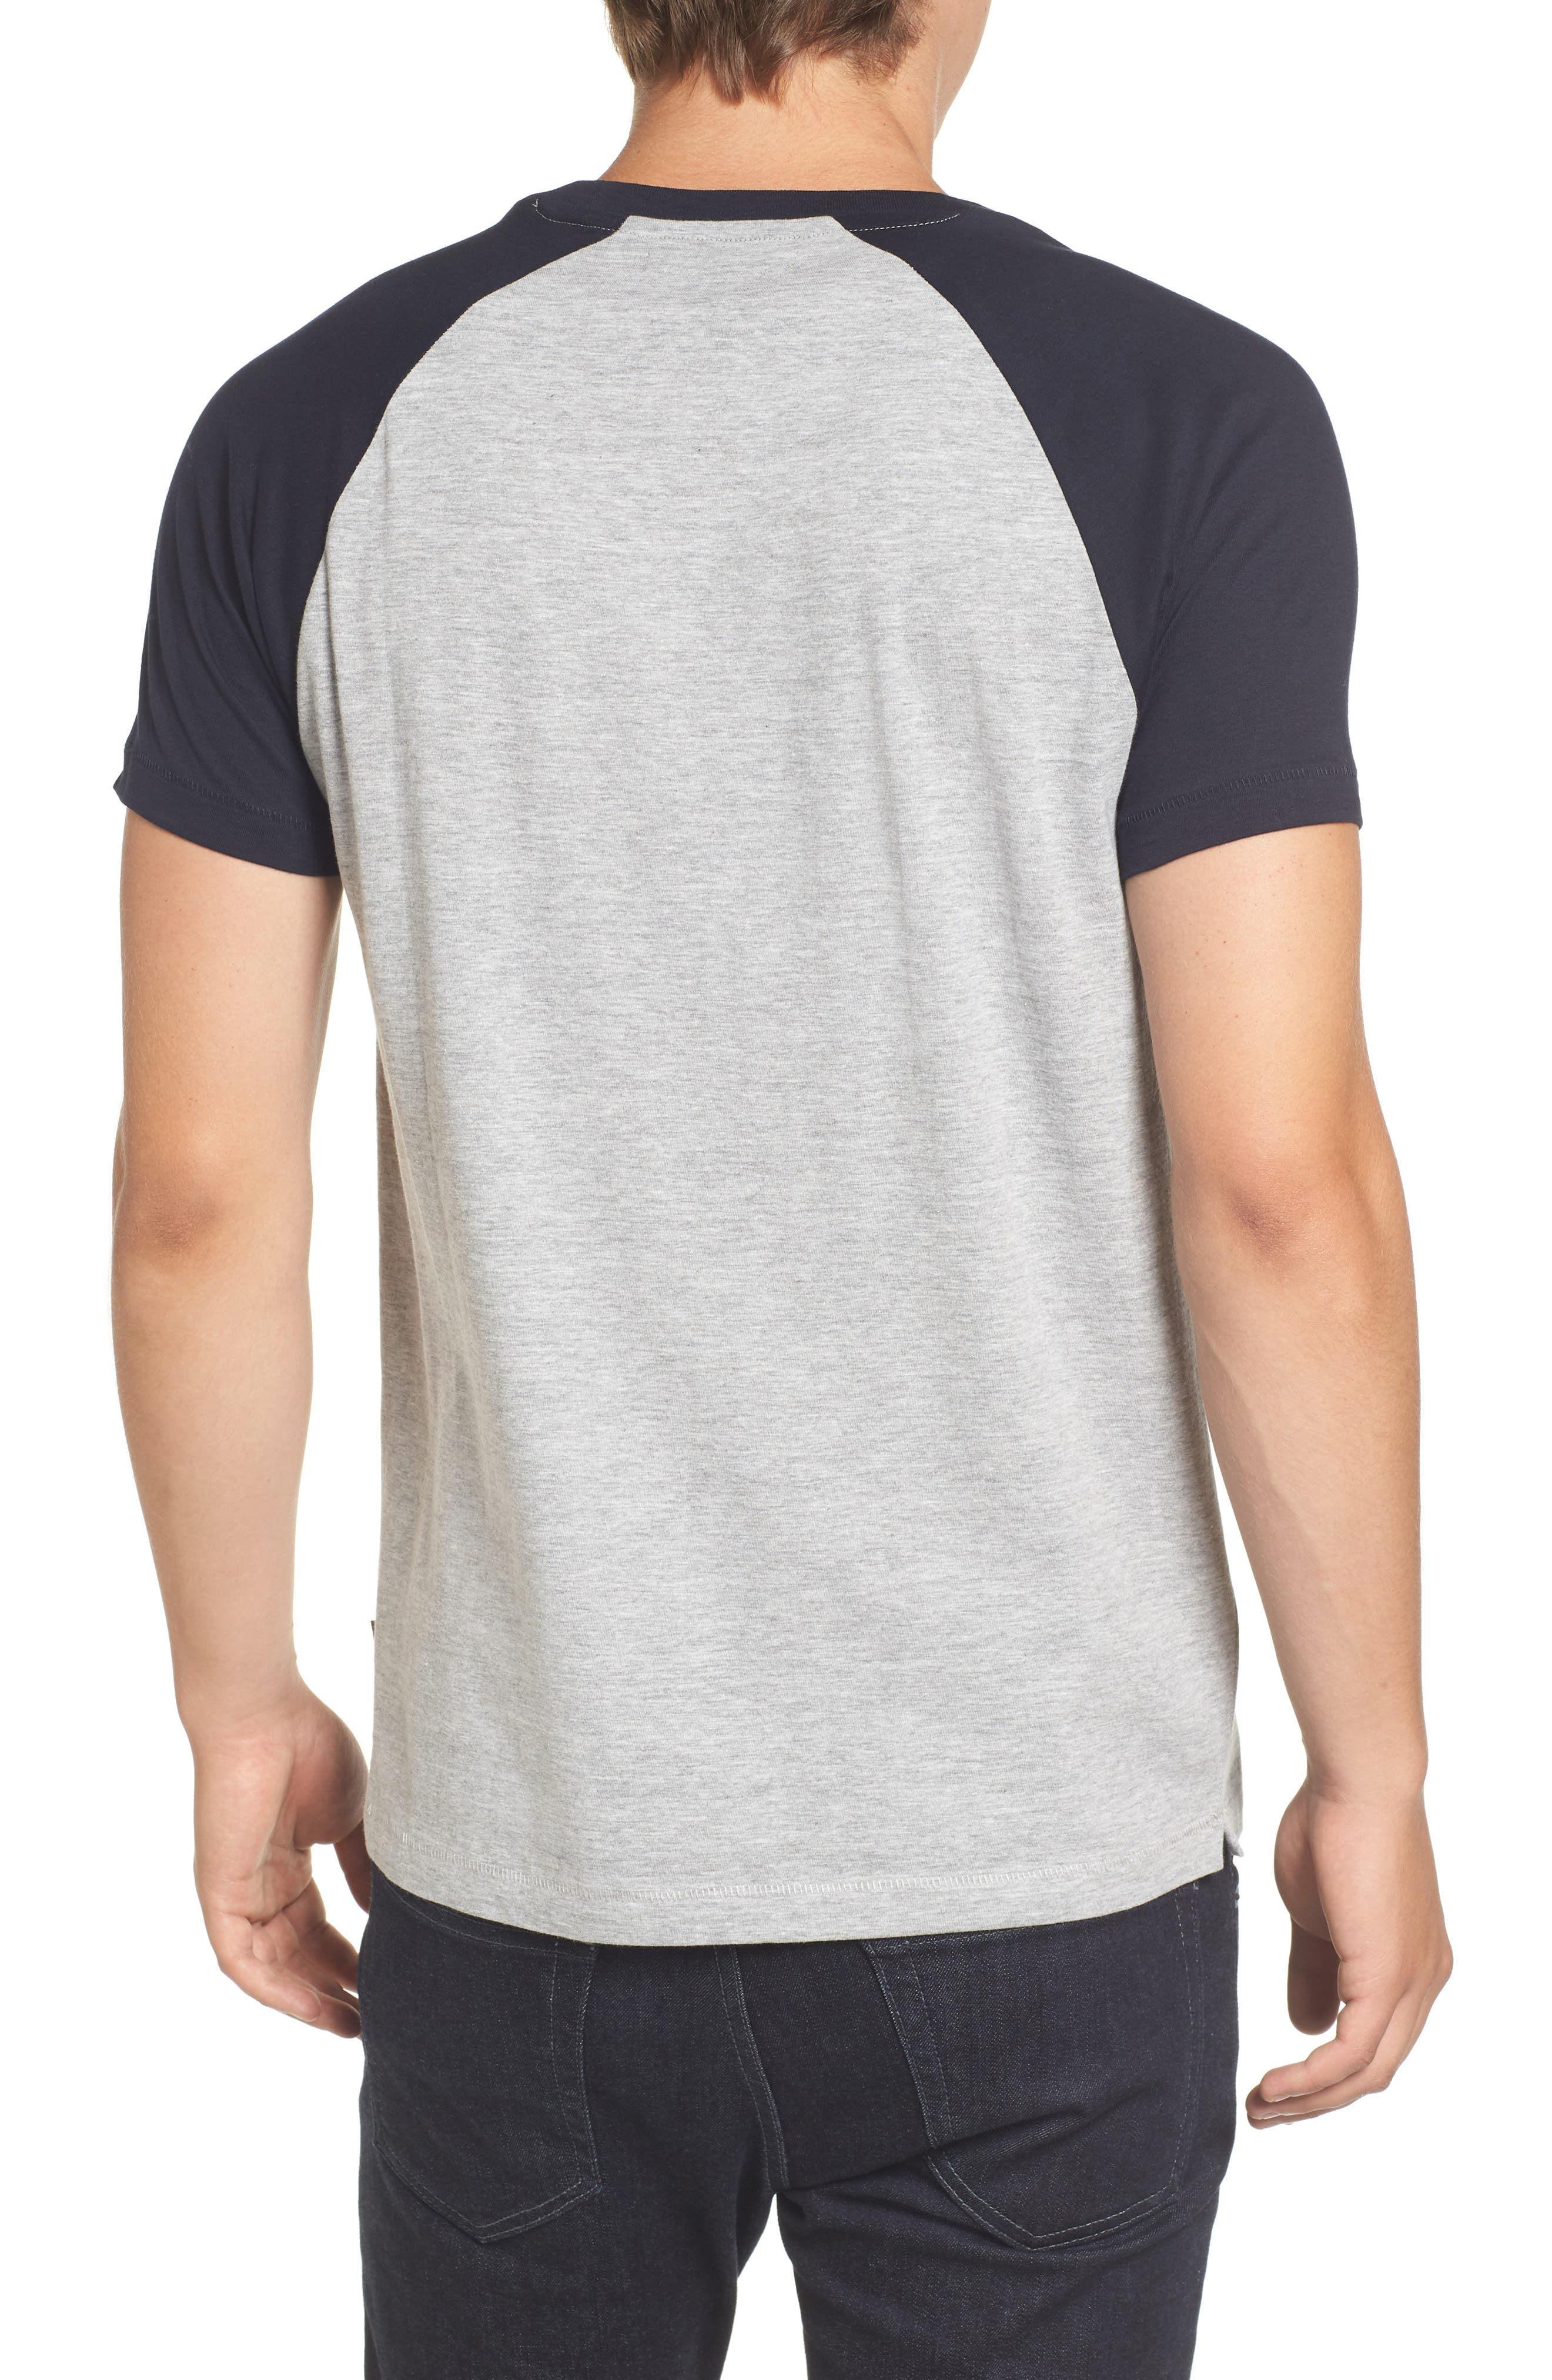 Alternate Image 2  - French Connection Raglan Short Sleeve T-Shirt